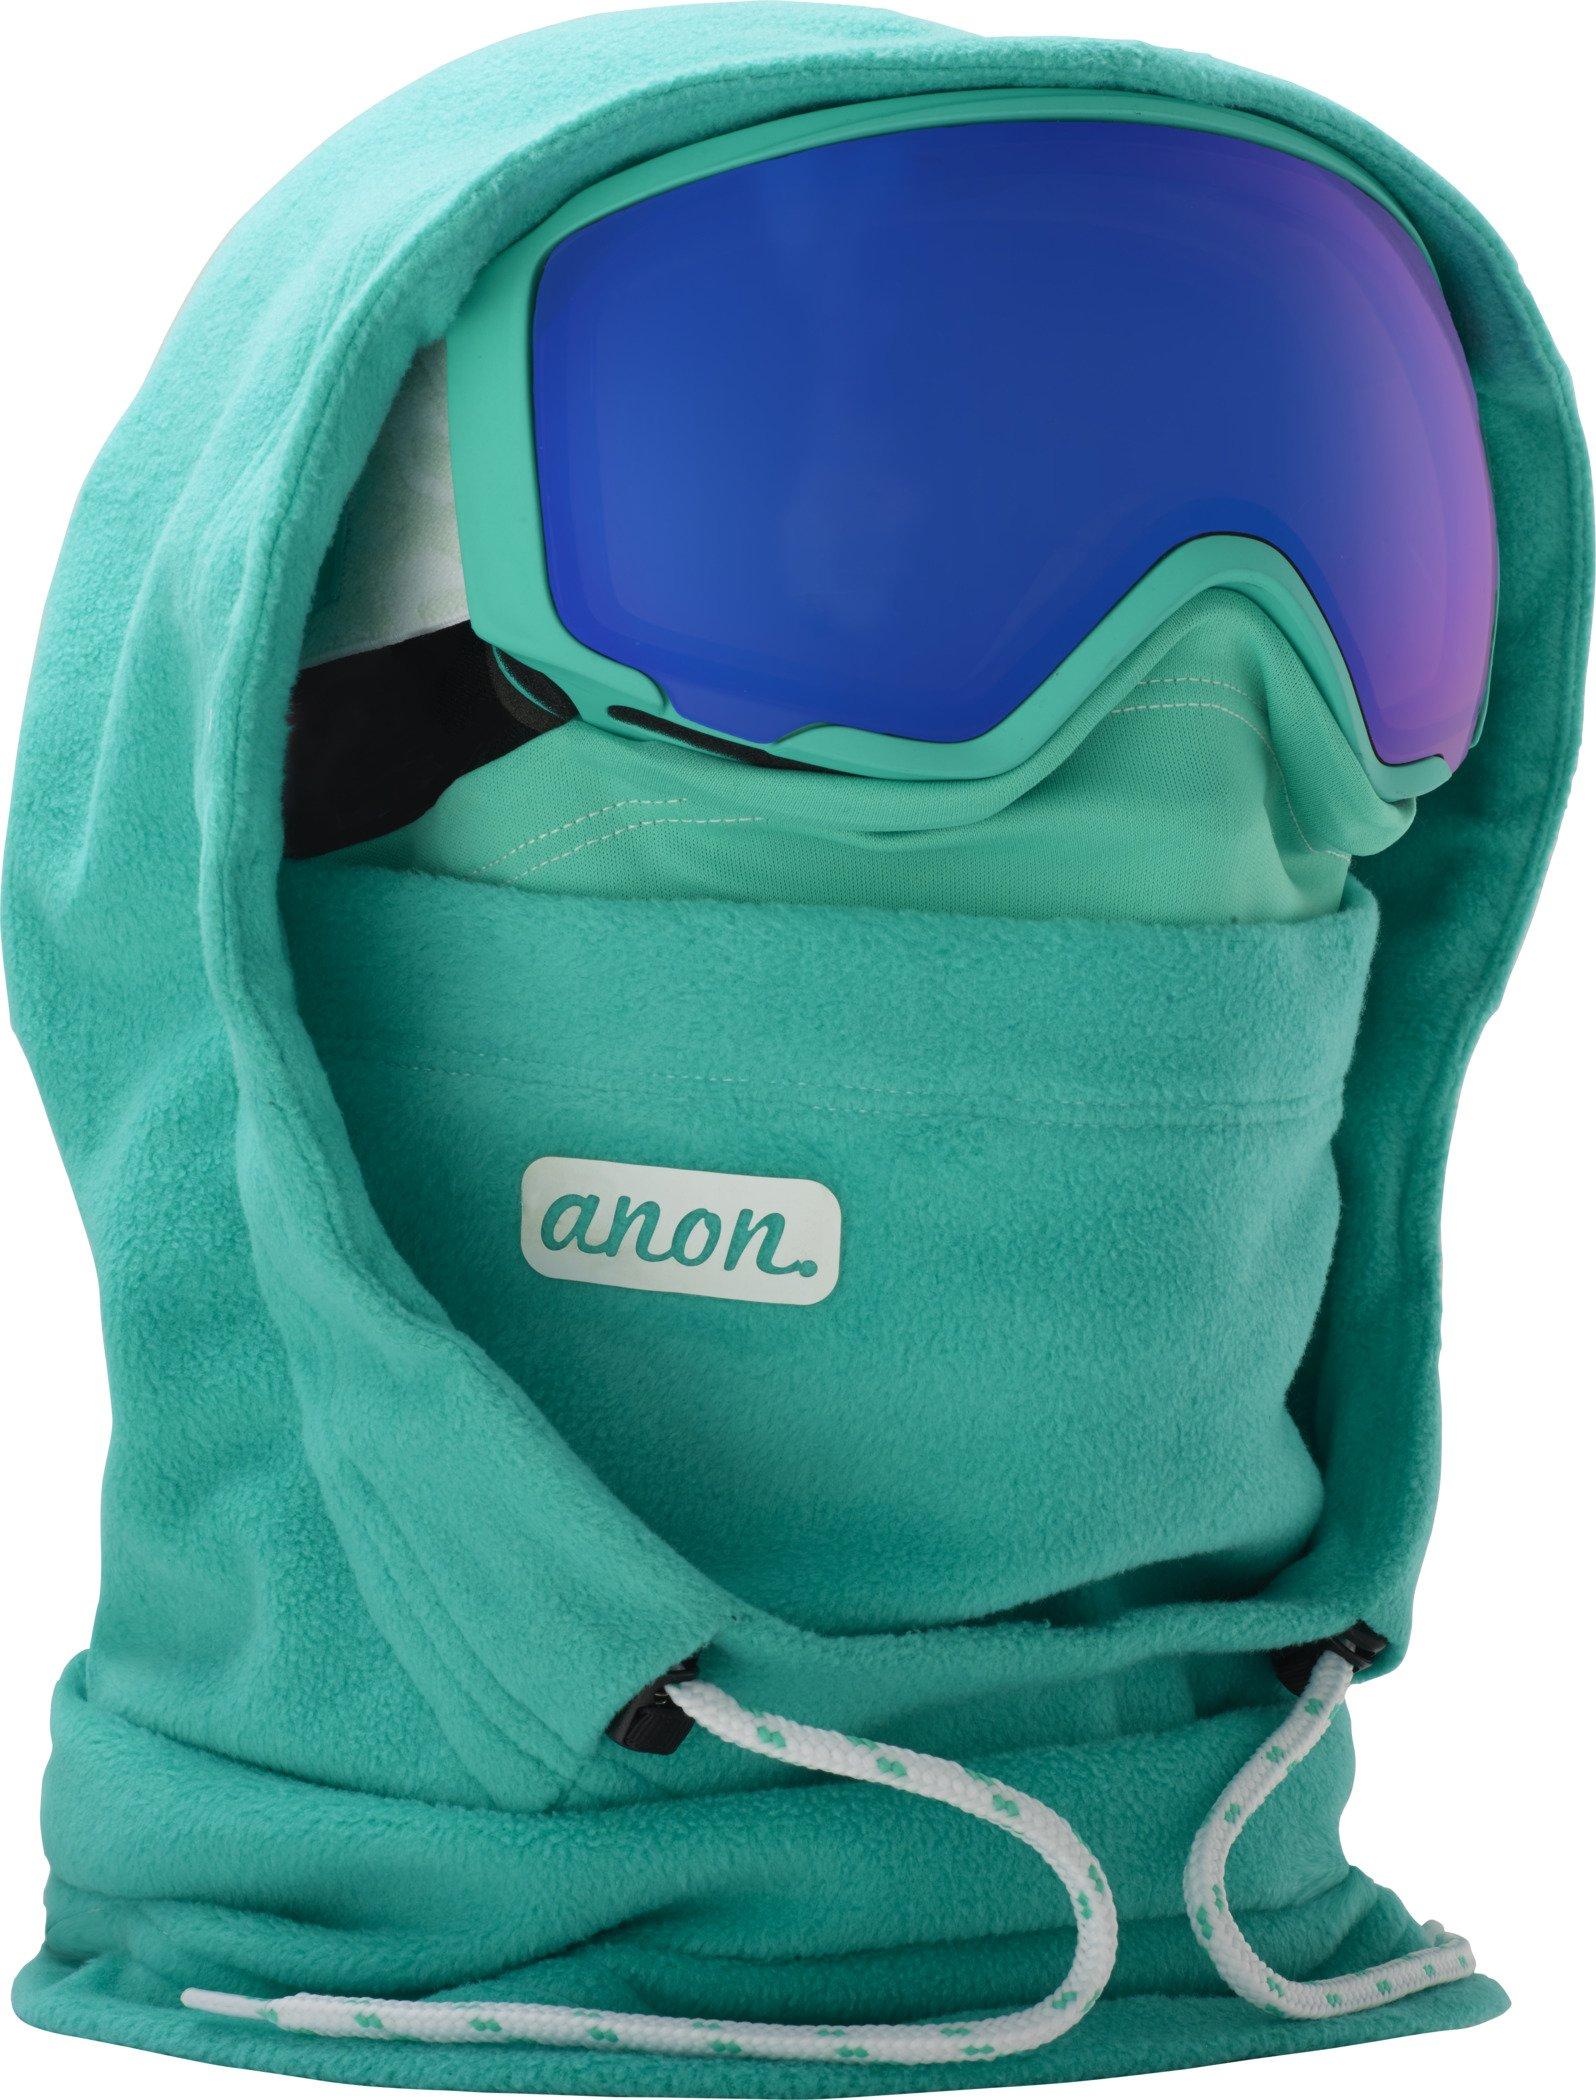 Anon MFI XL Helmet Hood Womens Balaclava One Size Empress Teal